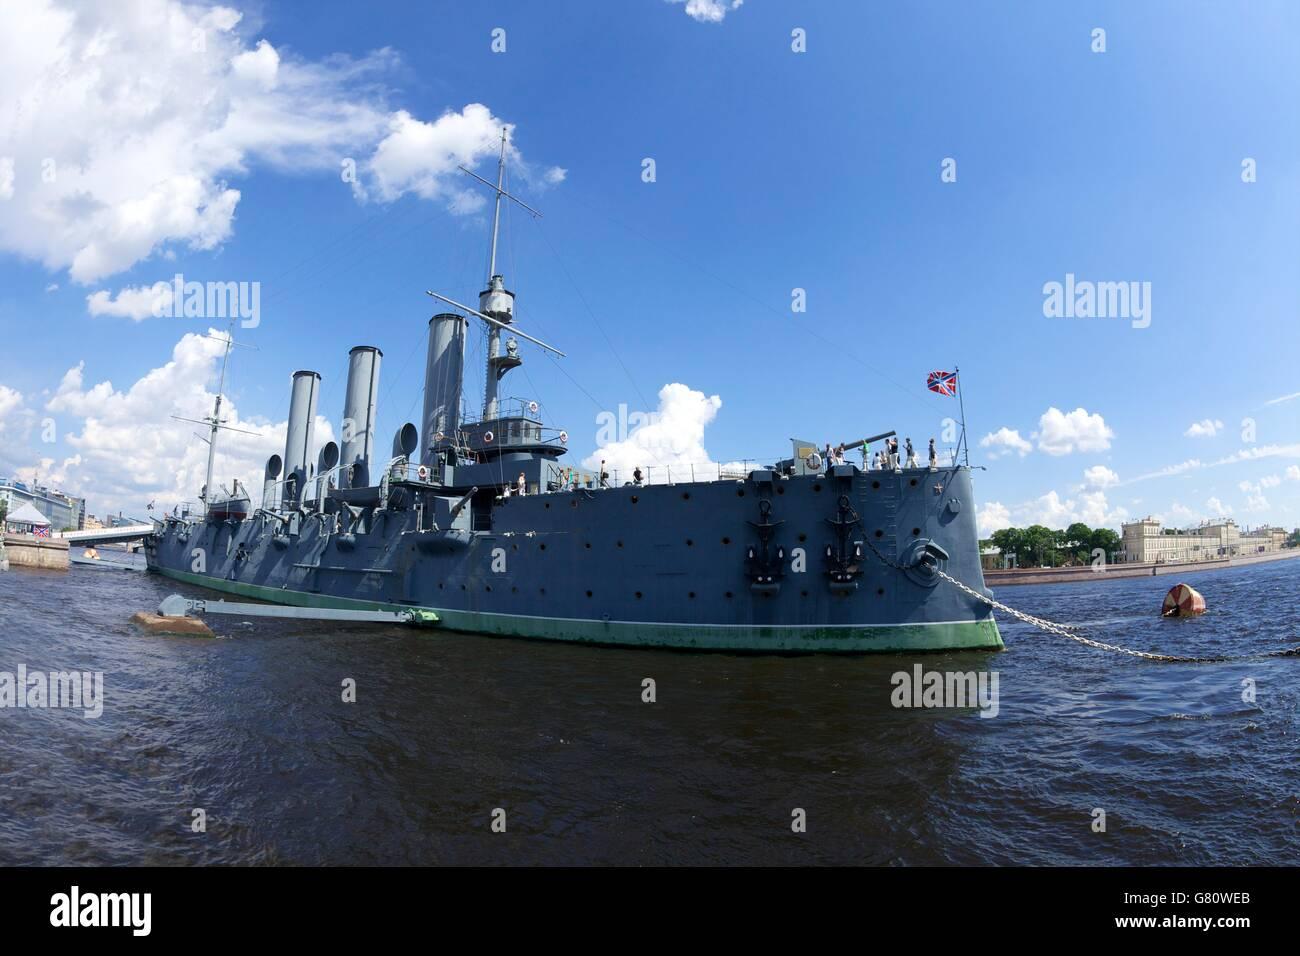 Aurora Cruiser on River Neva, Naval Academy, St Petersburg, Russia - Stock Image